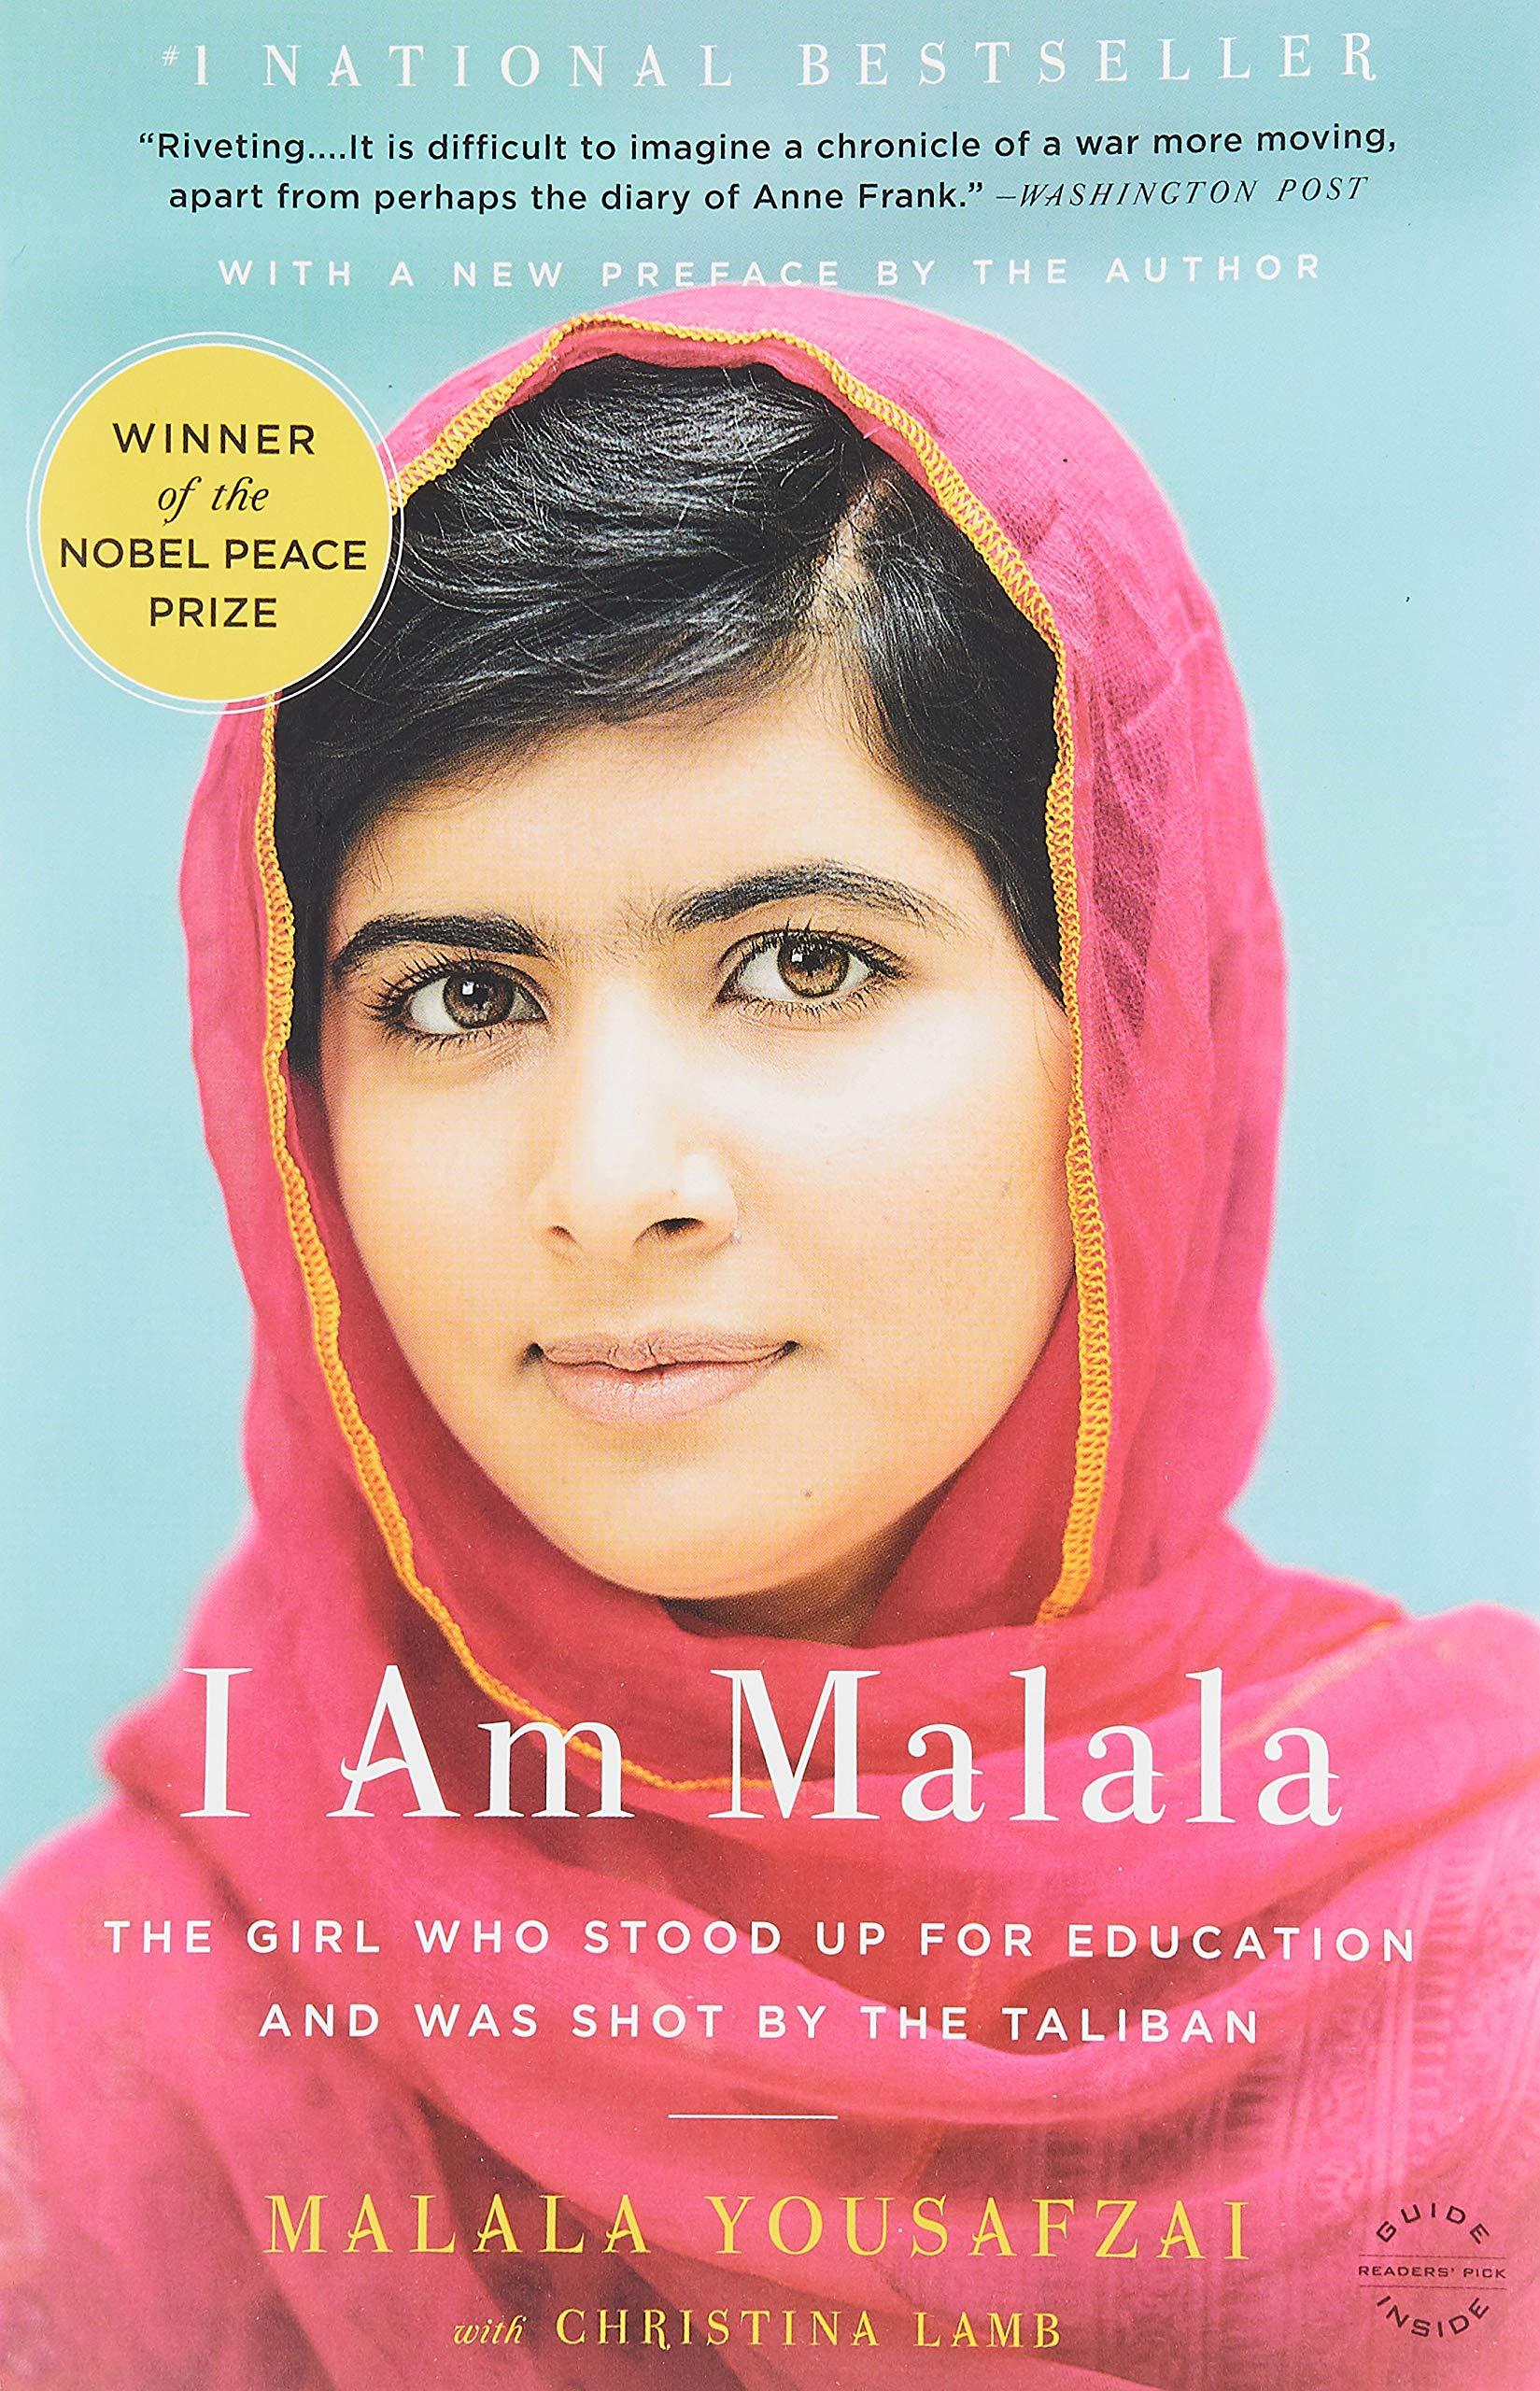 I Am Malala: The Girl Who Stood Up for Education and Was Shot by the Taliban: Yousafzai, Malala, Lamb, Christina: 0884340159730: Amazon.com: Books